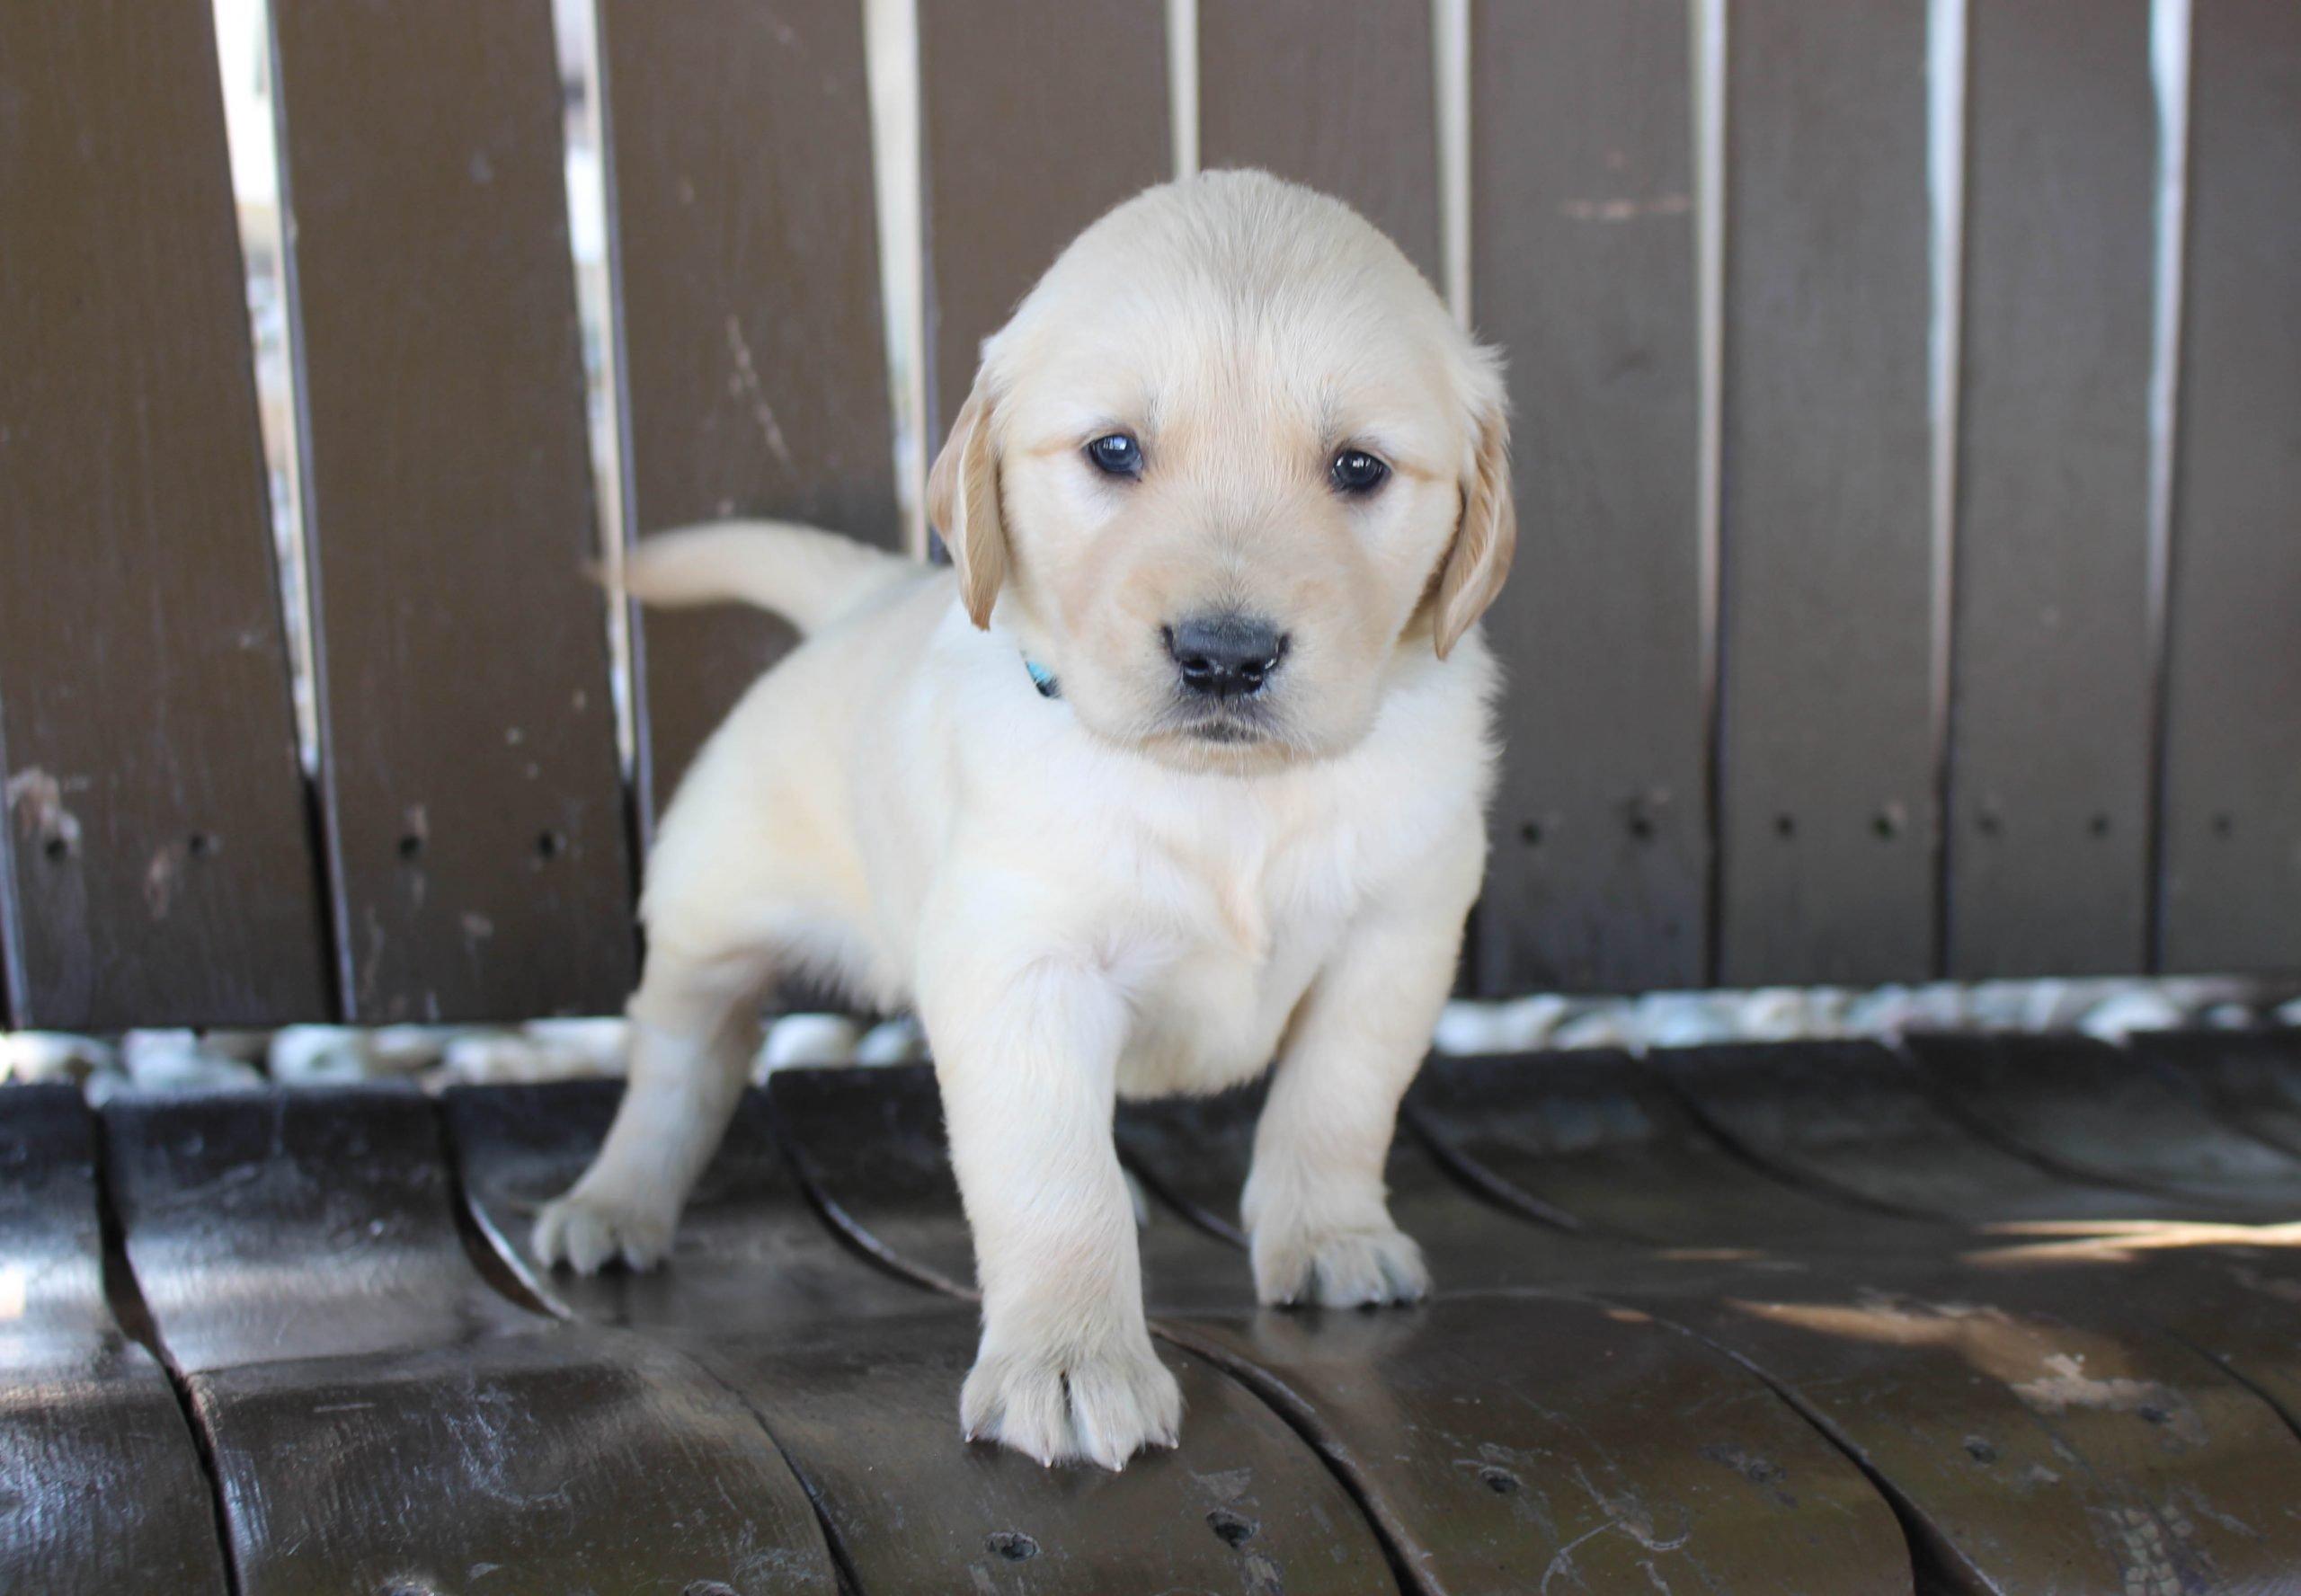 Tyson - AKC Golden Retriever male puppy for sale in Grabill, Indiana